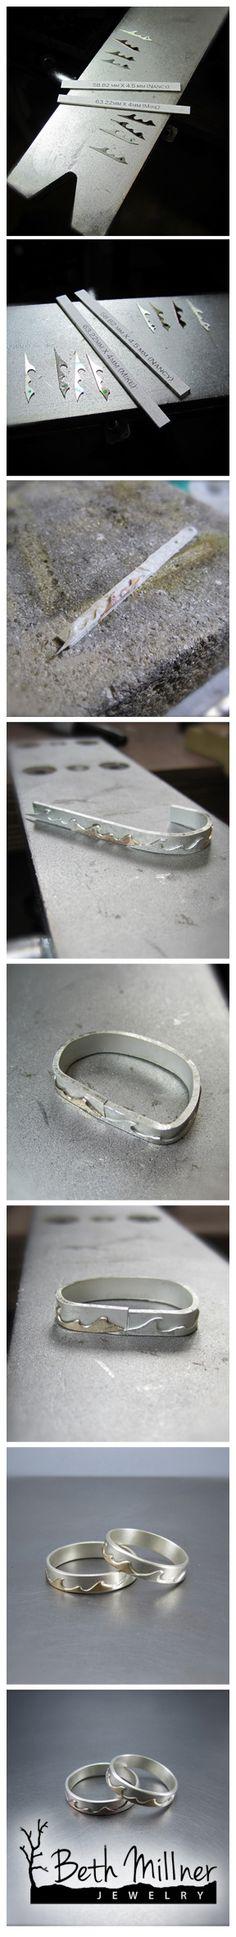 Wedding Rings in progress by Beth Millner Jewelry.  http://www.bethmillner.com